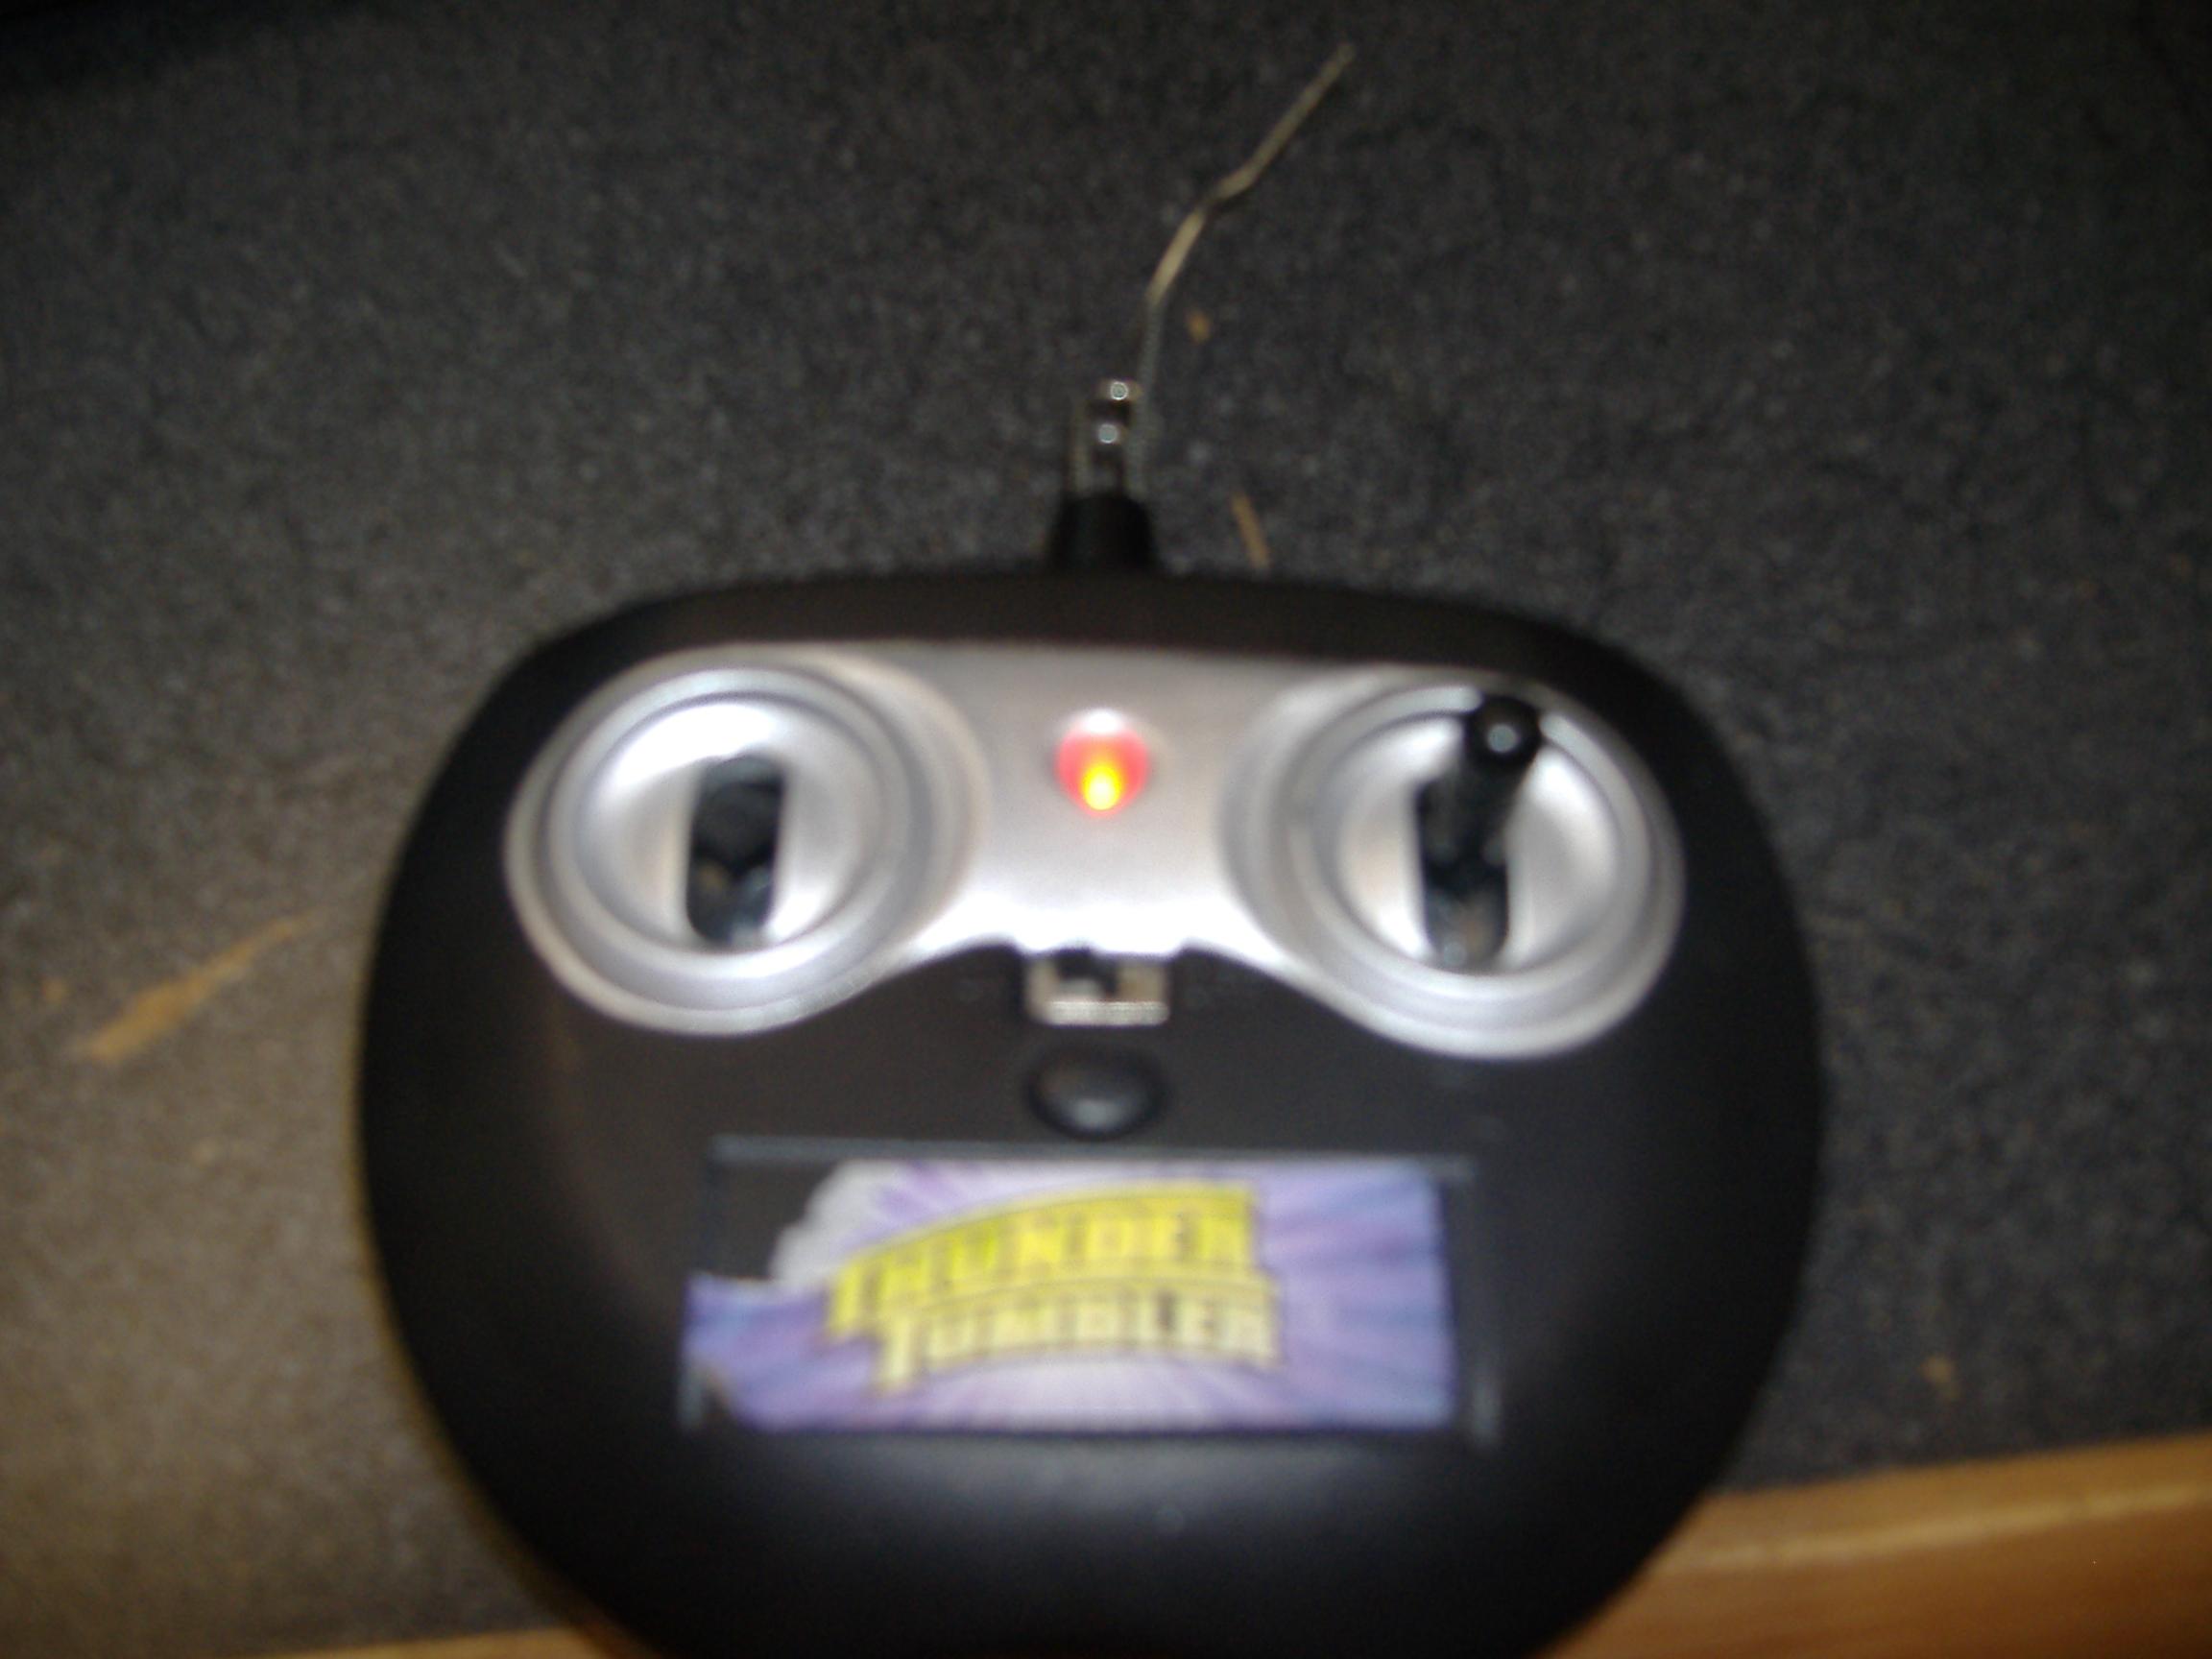 Radio jammer